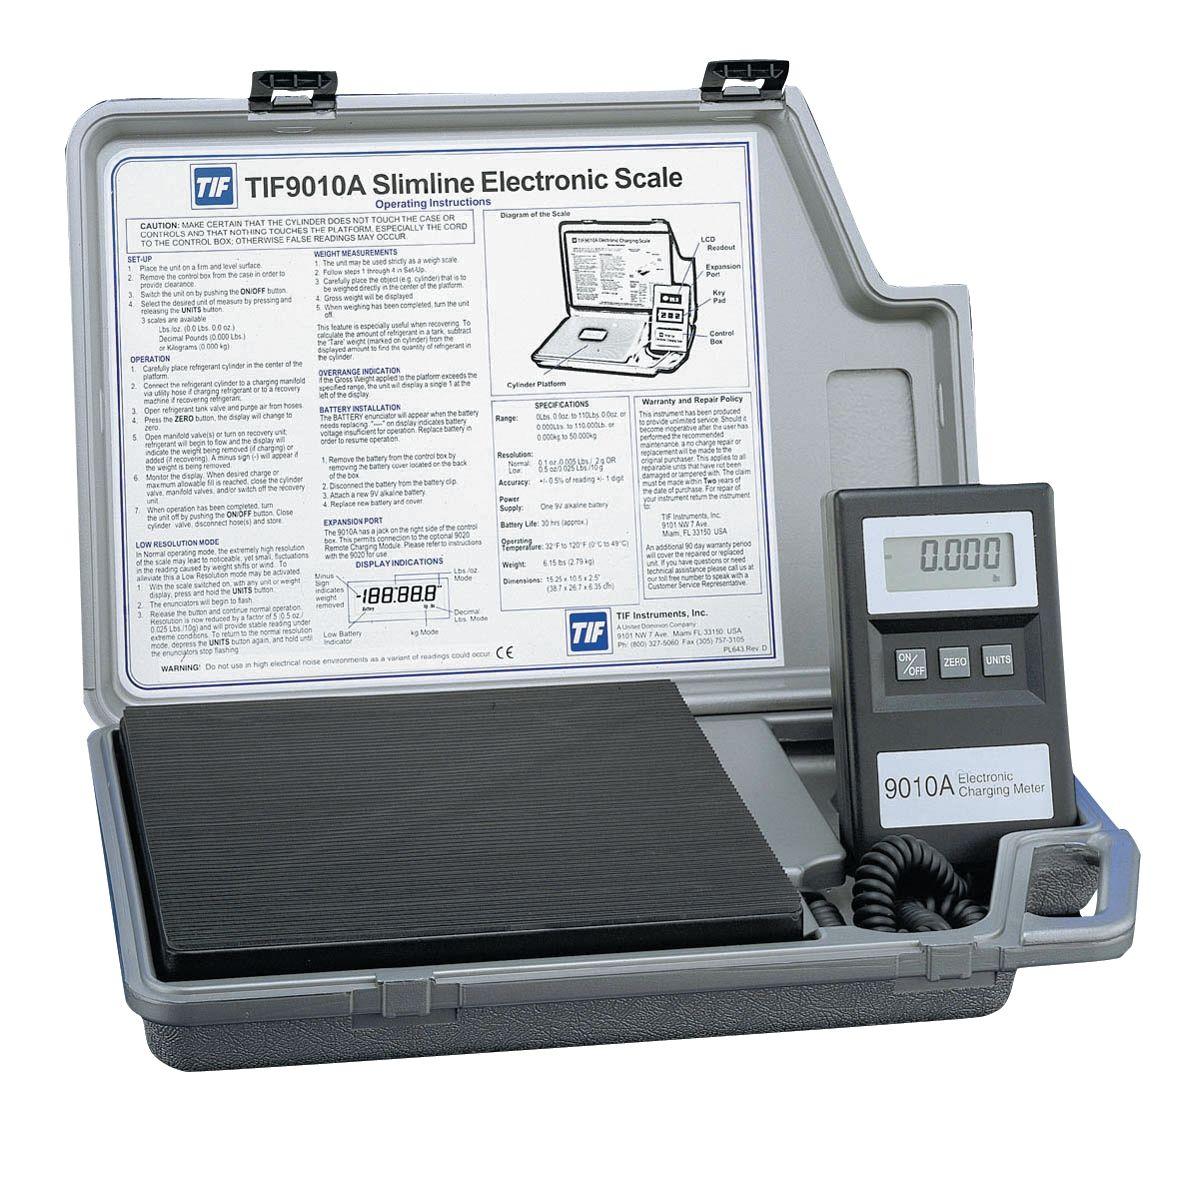 Tif 9010A SlimLine Electronic A/C Refrigerant Charging Scale TIF9010A #576074